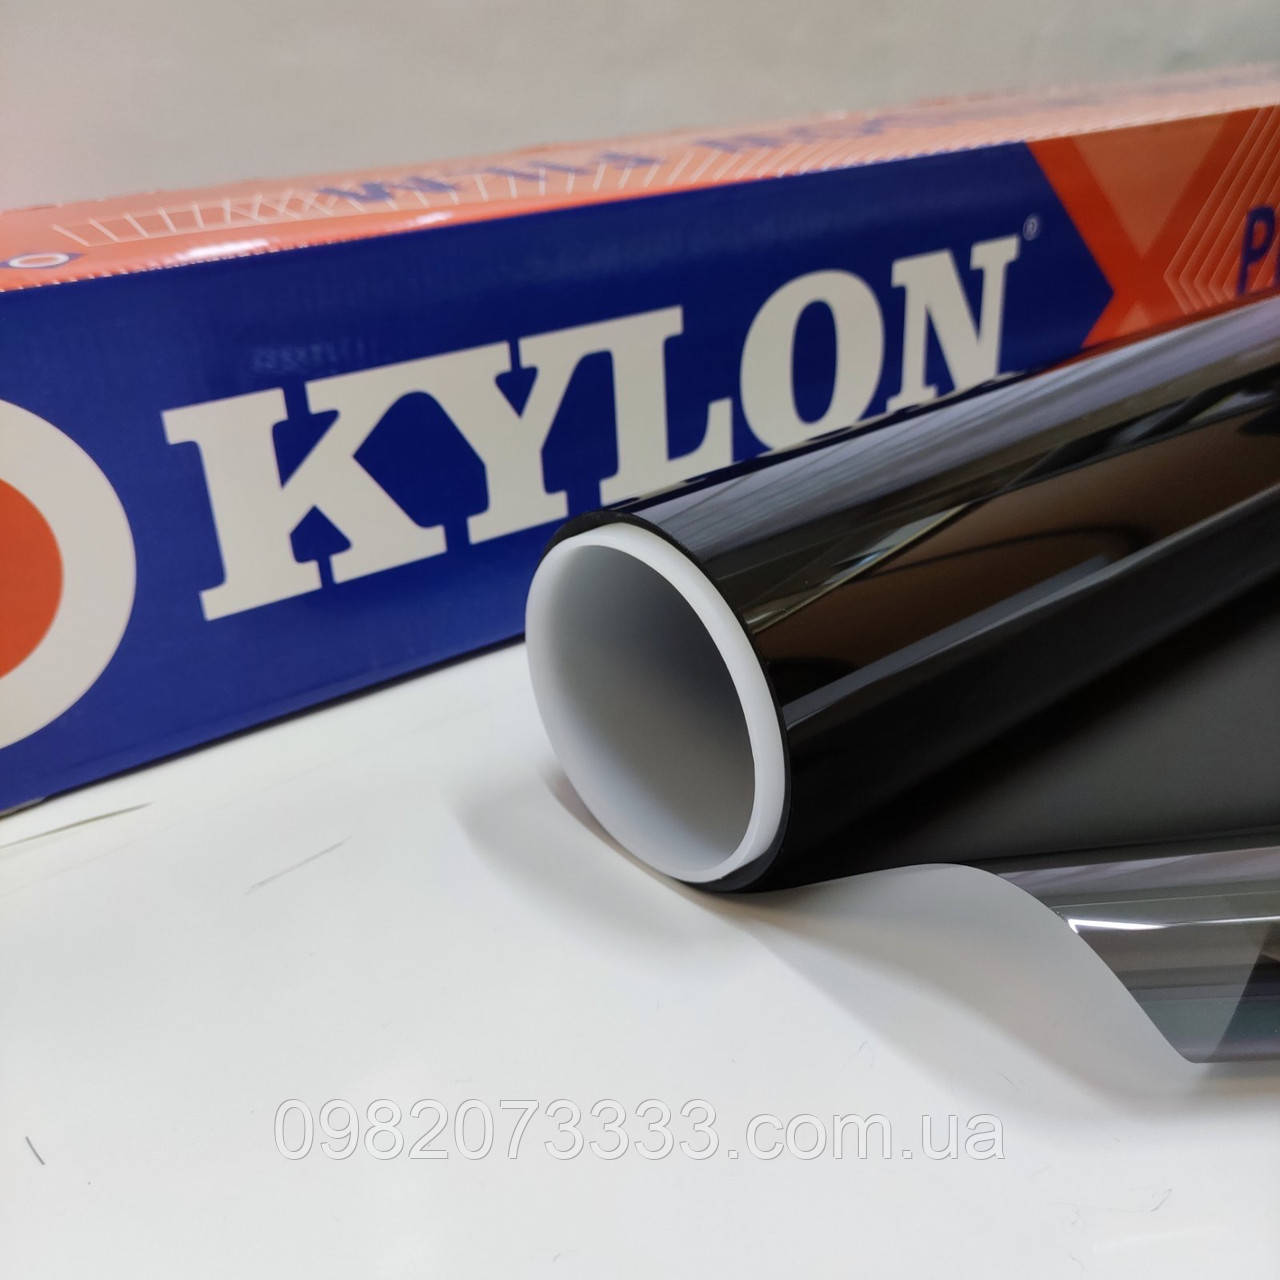 Автомобильная NR Black 35 (цвет: чёрный) тонировочная солнцезащитная плёнка Kylon ширина 1,524 (цена за кв.м.)